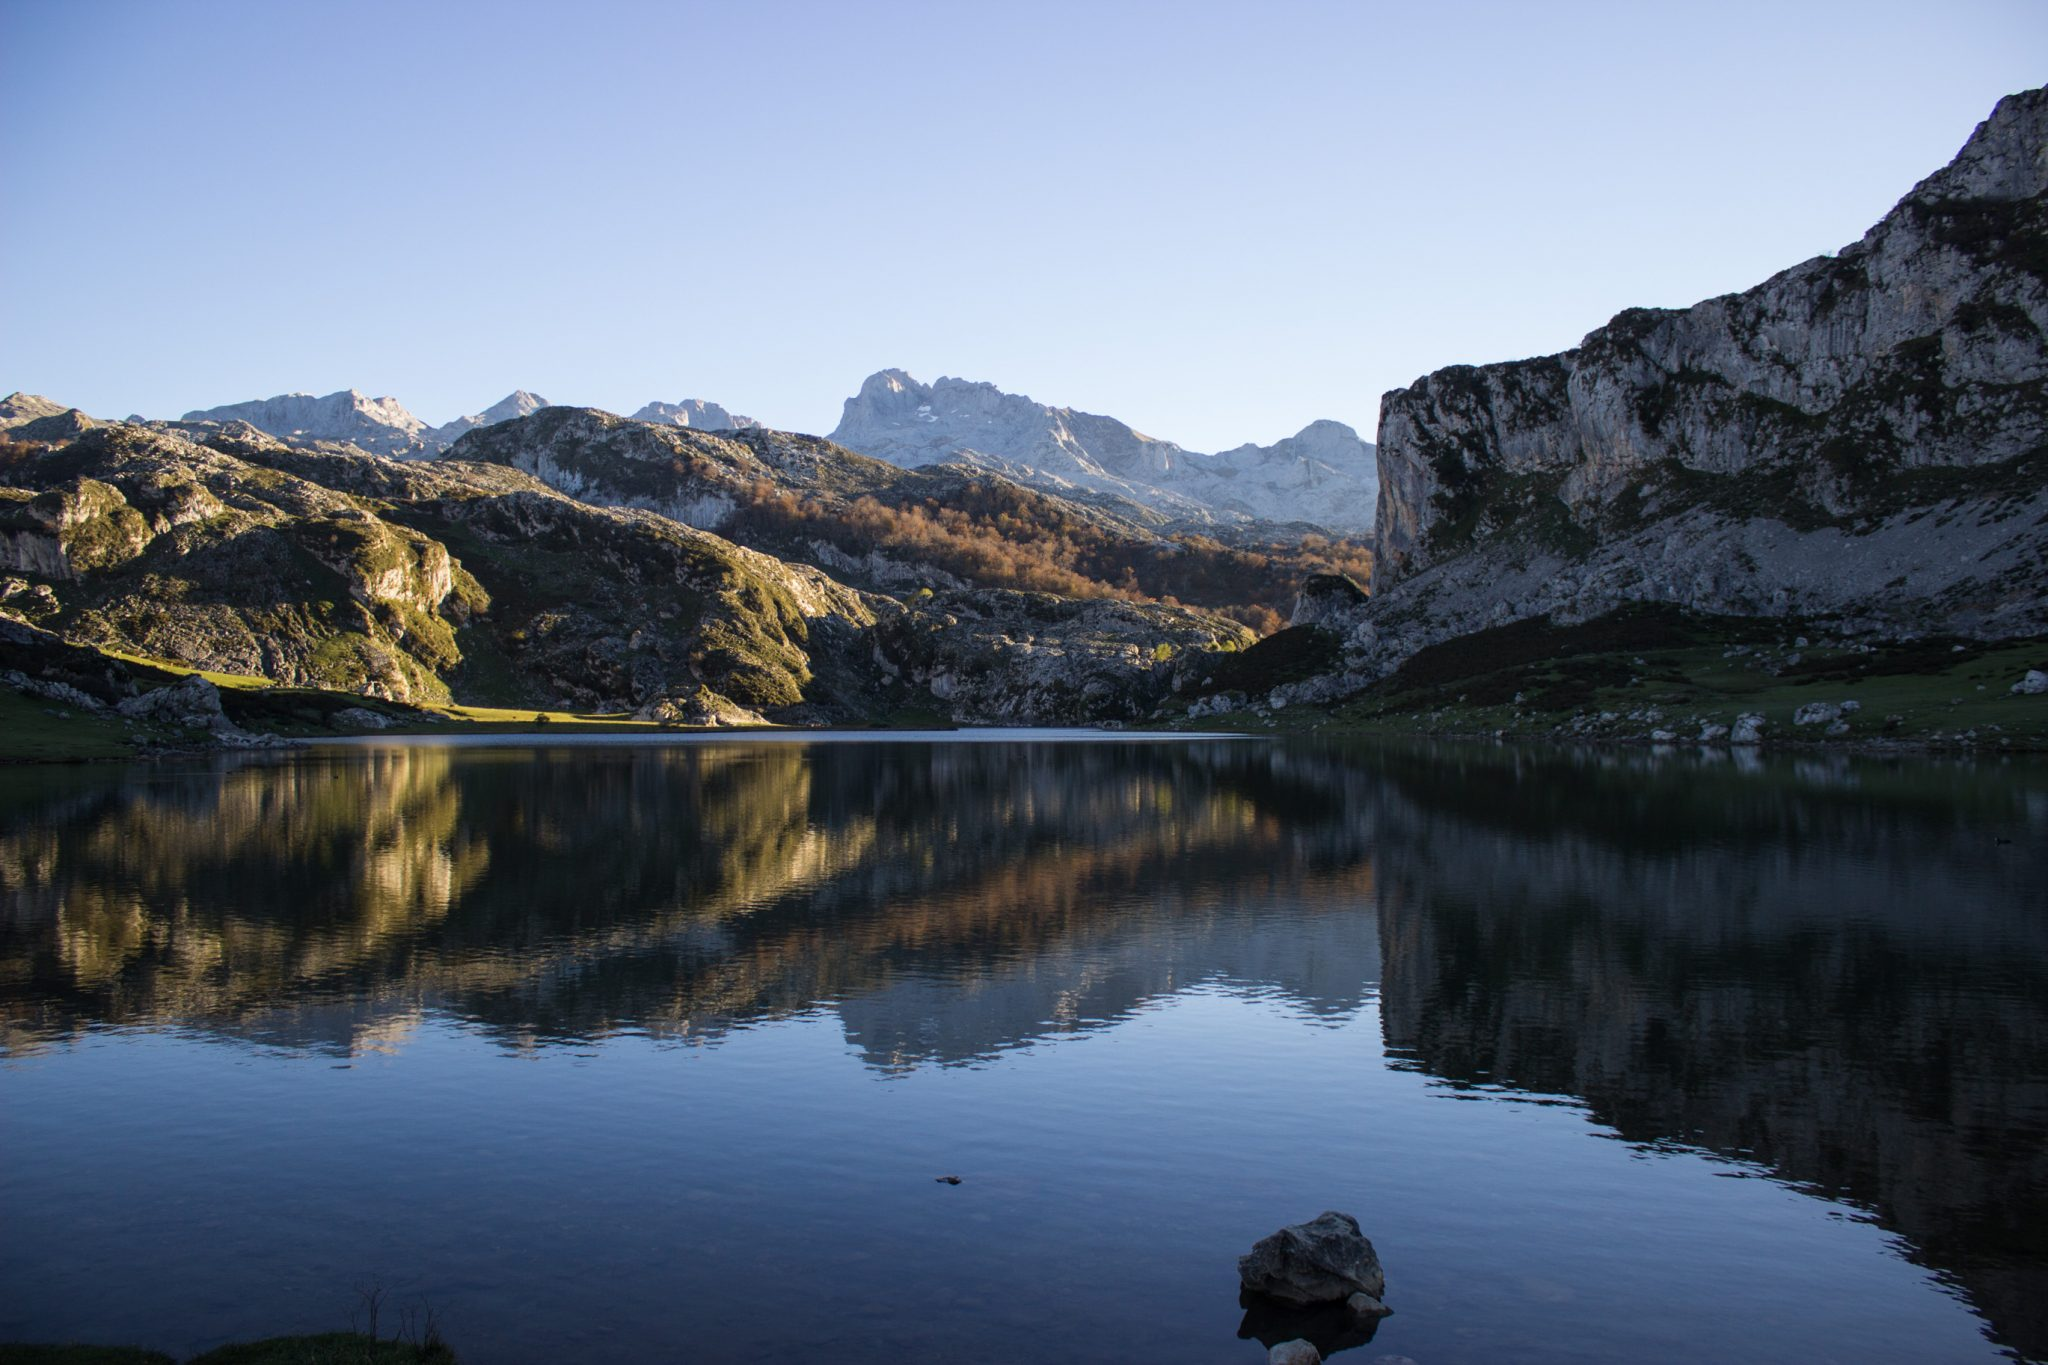 Wanderung Mirador de Ordiales Picos de Europa Spanien, schöner See, Lagos de Covadonga, Felsen spiegeln sich im glatten Wasser